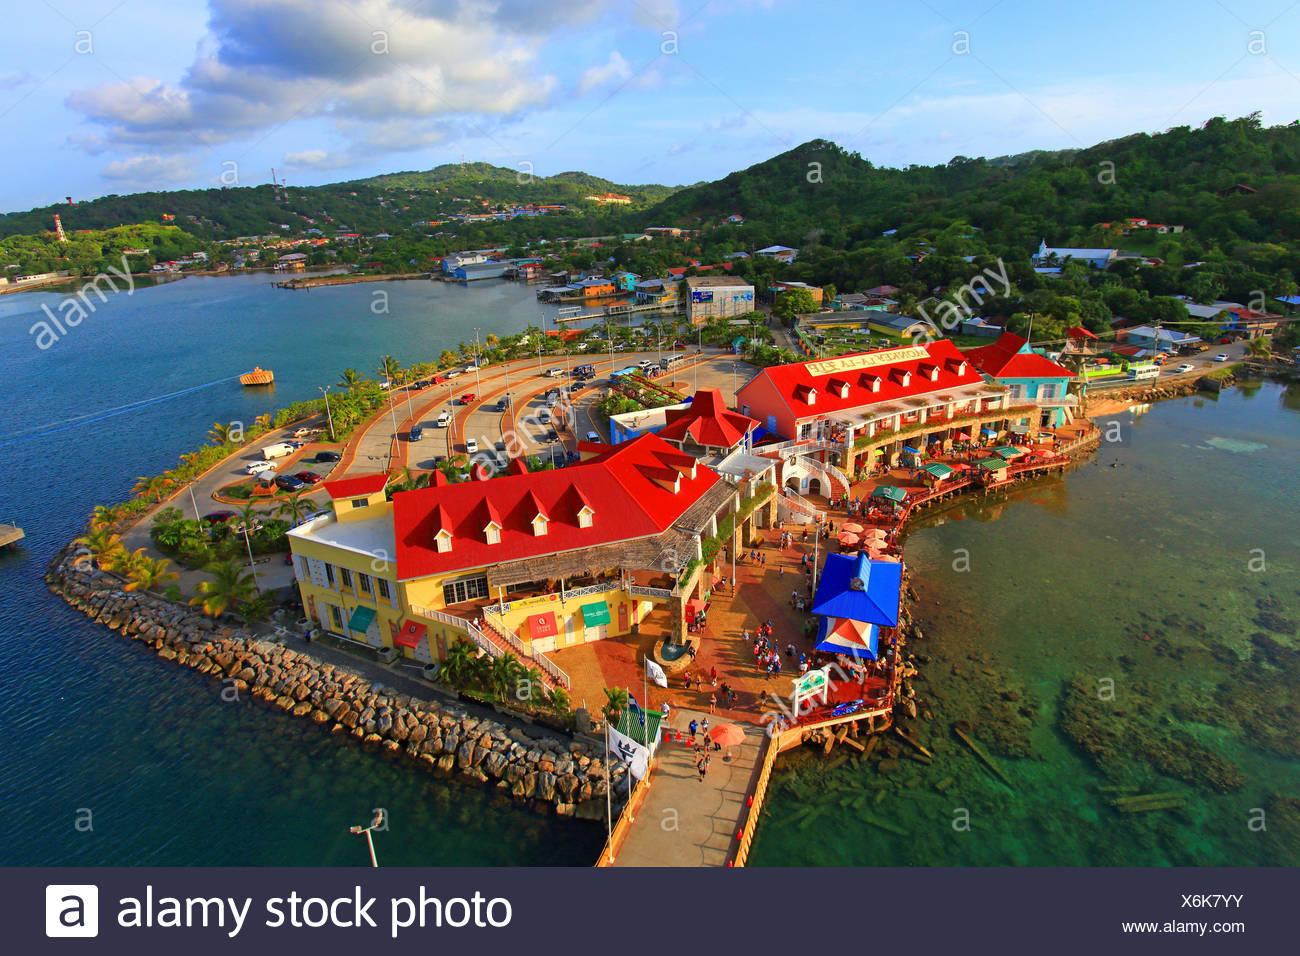 Honduras Islas De La Bahia Roatan Island Coxen Hole Stock Photo